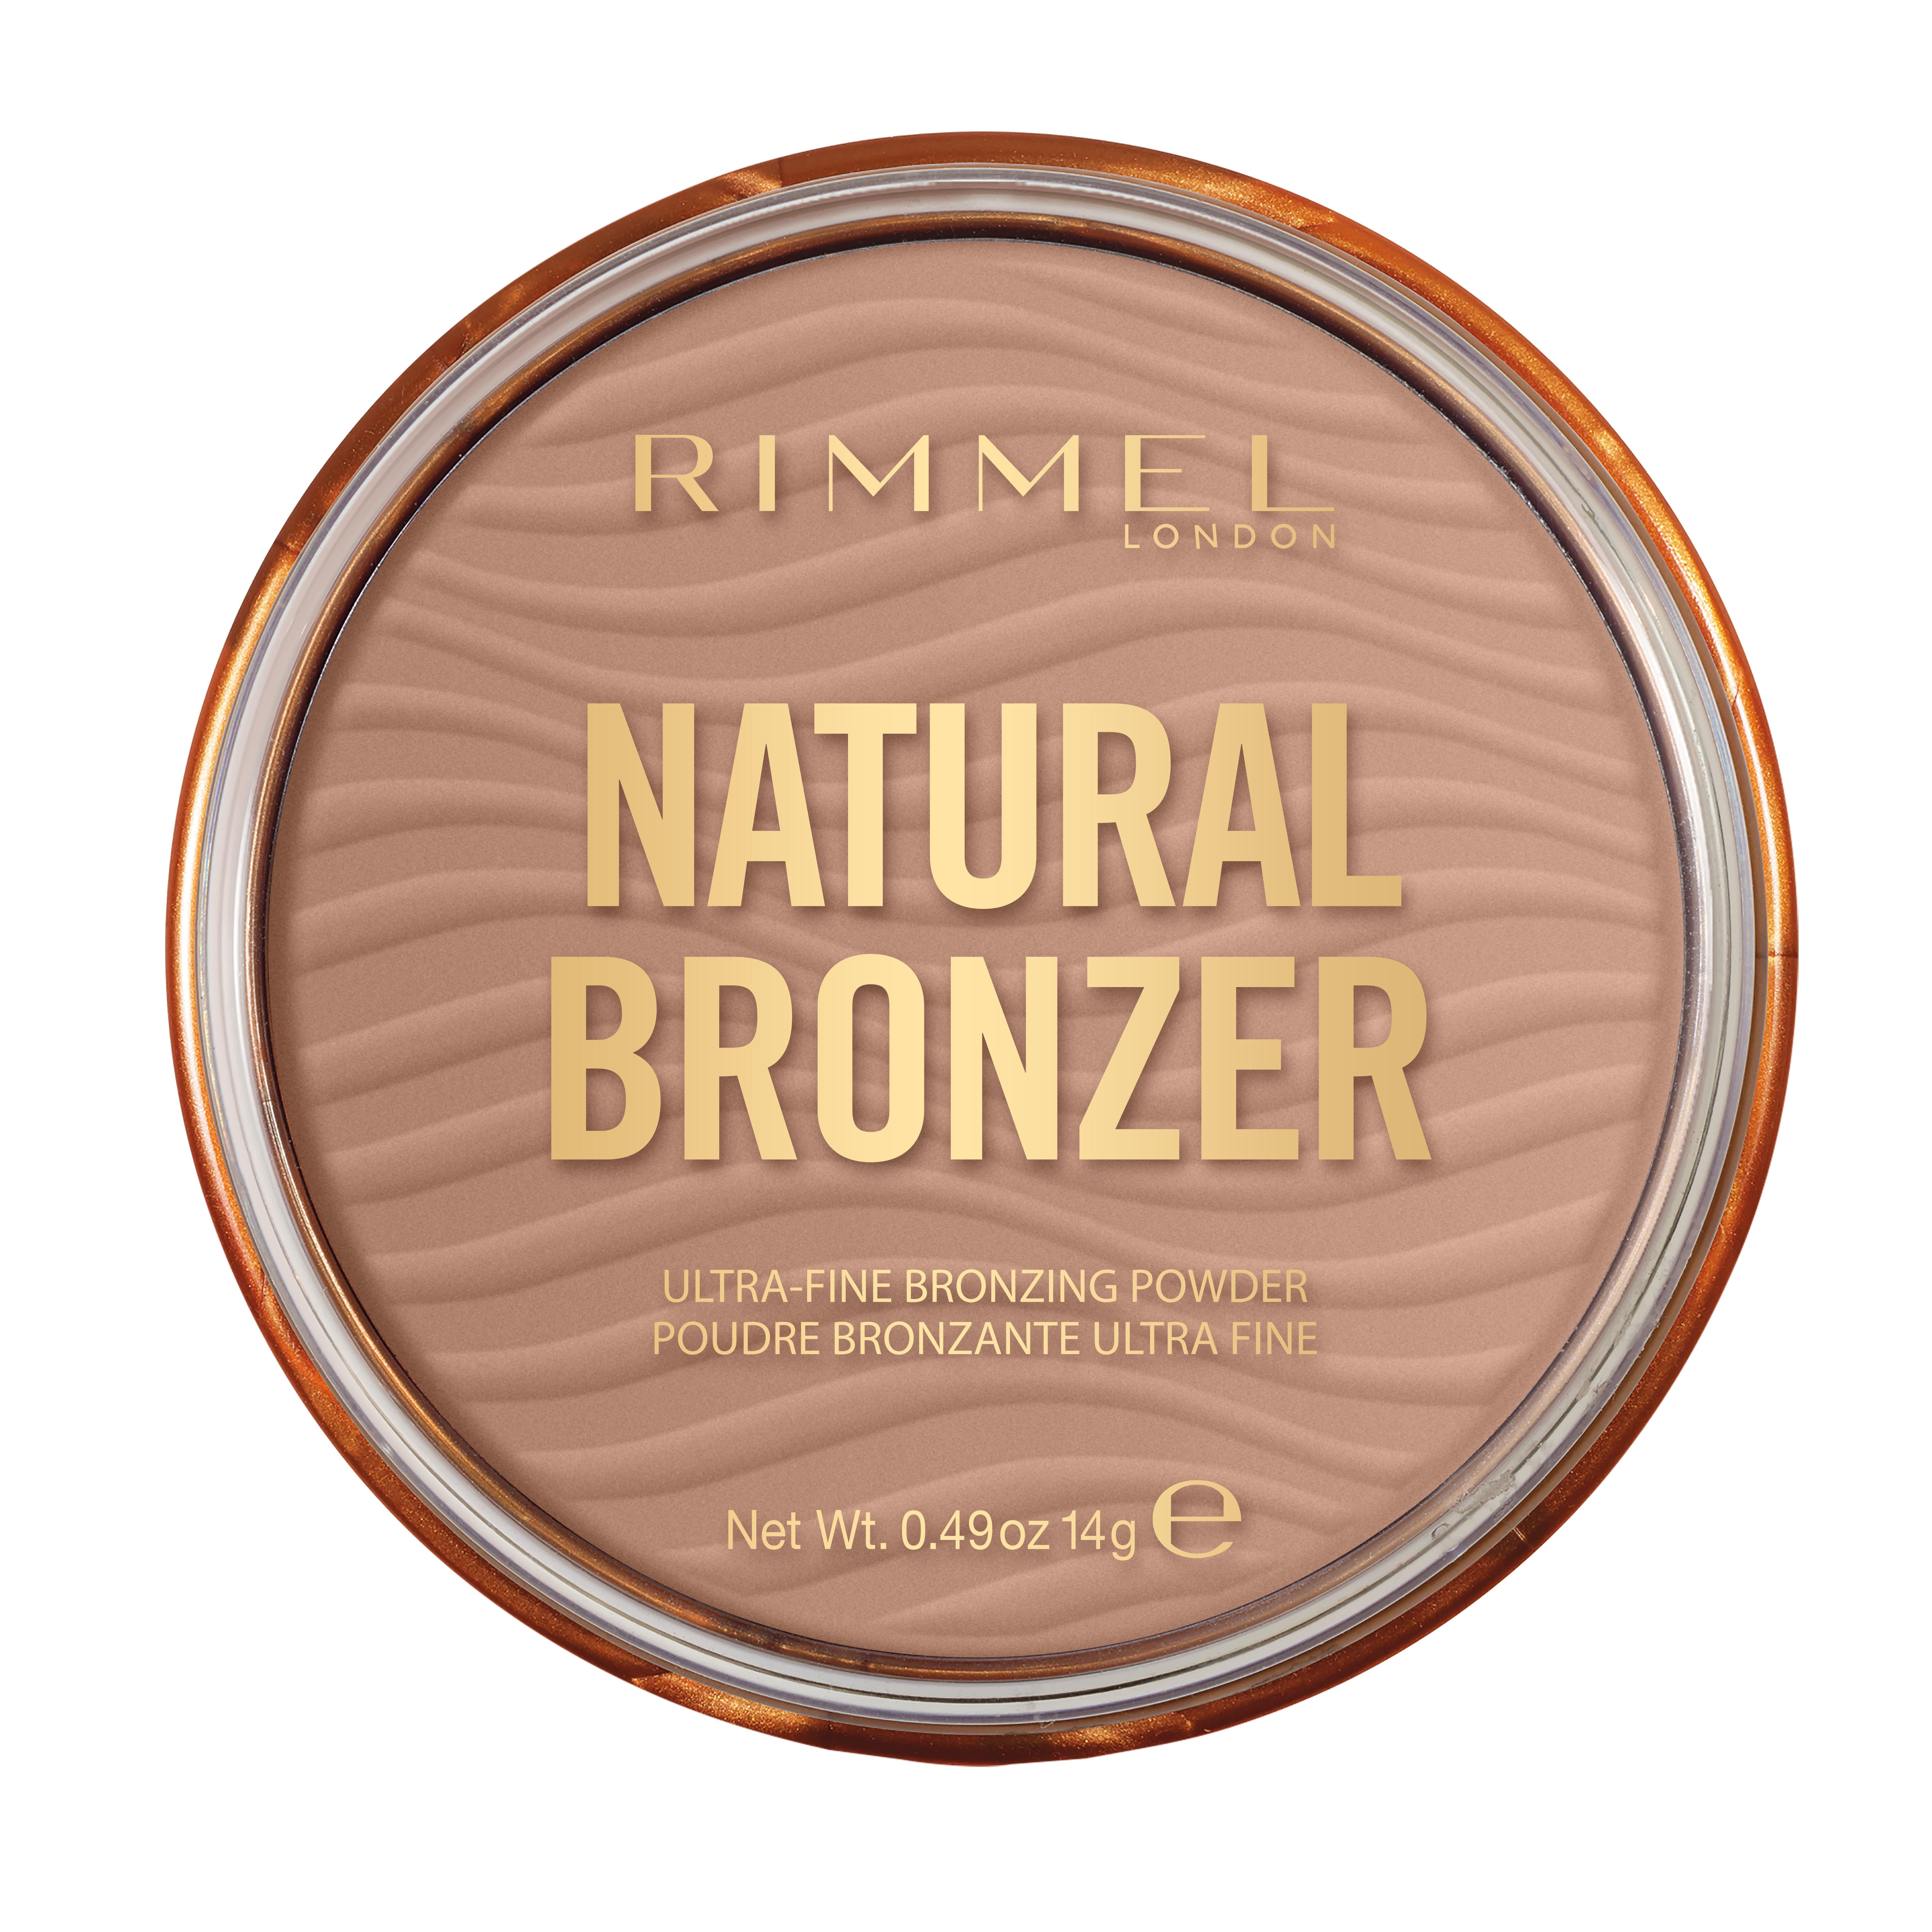 9) Terra Rimmel_Natural Bronzer